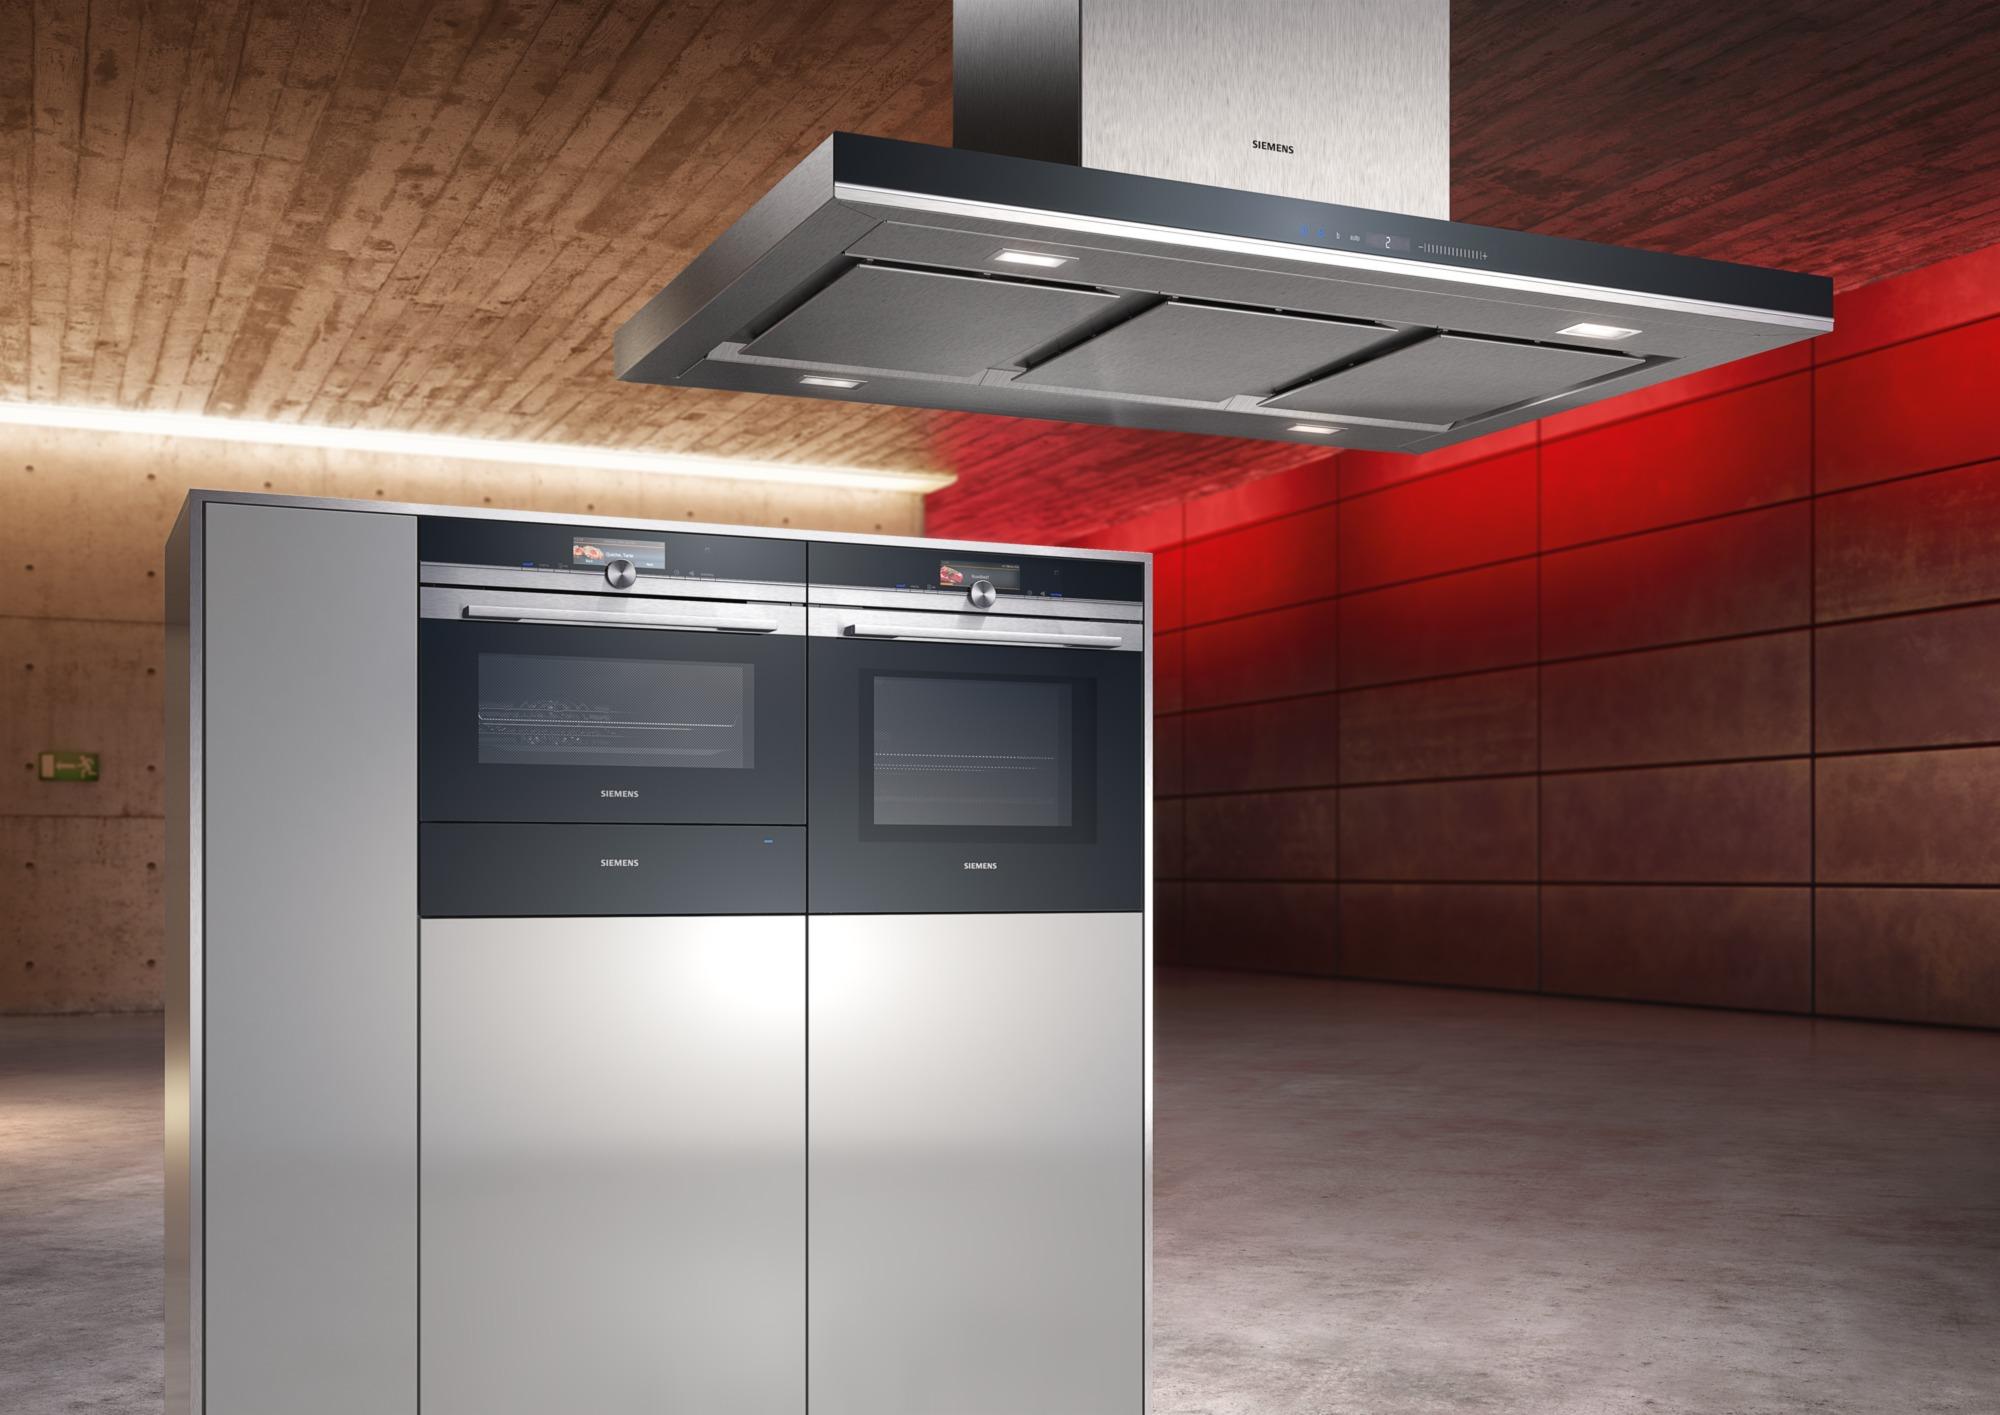 Siemens Kitchen Appliances Squaremelon Squaremelon